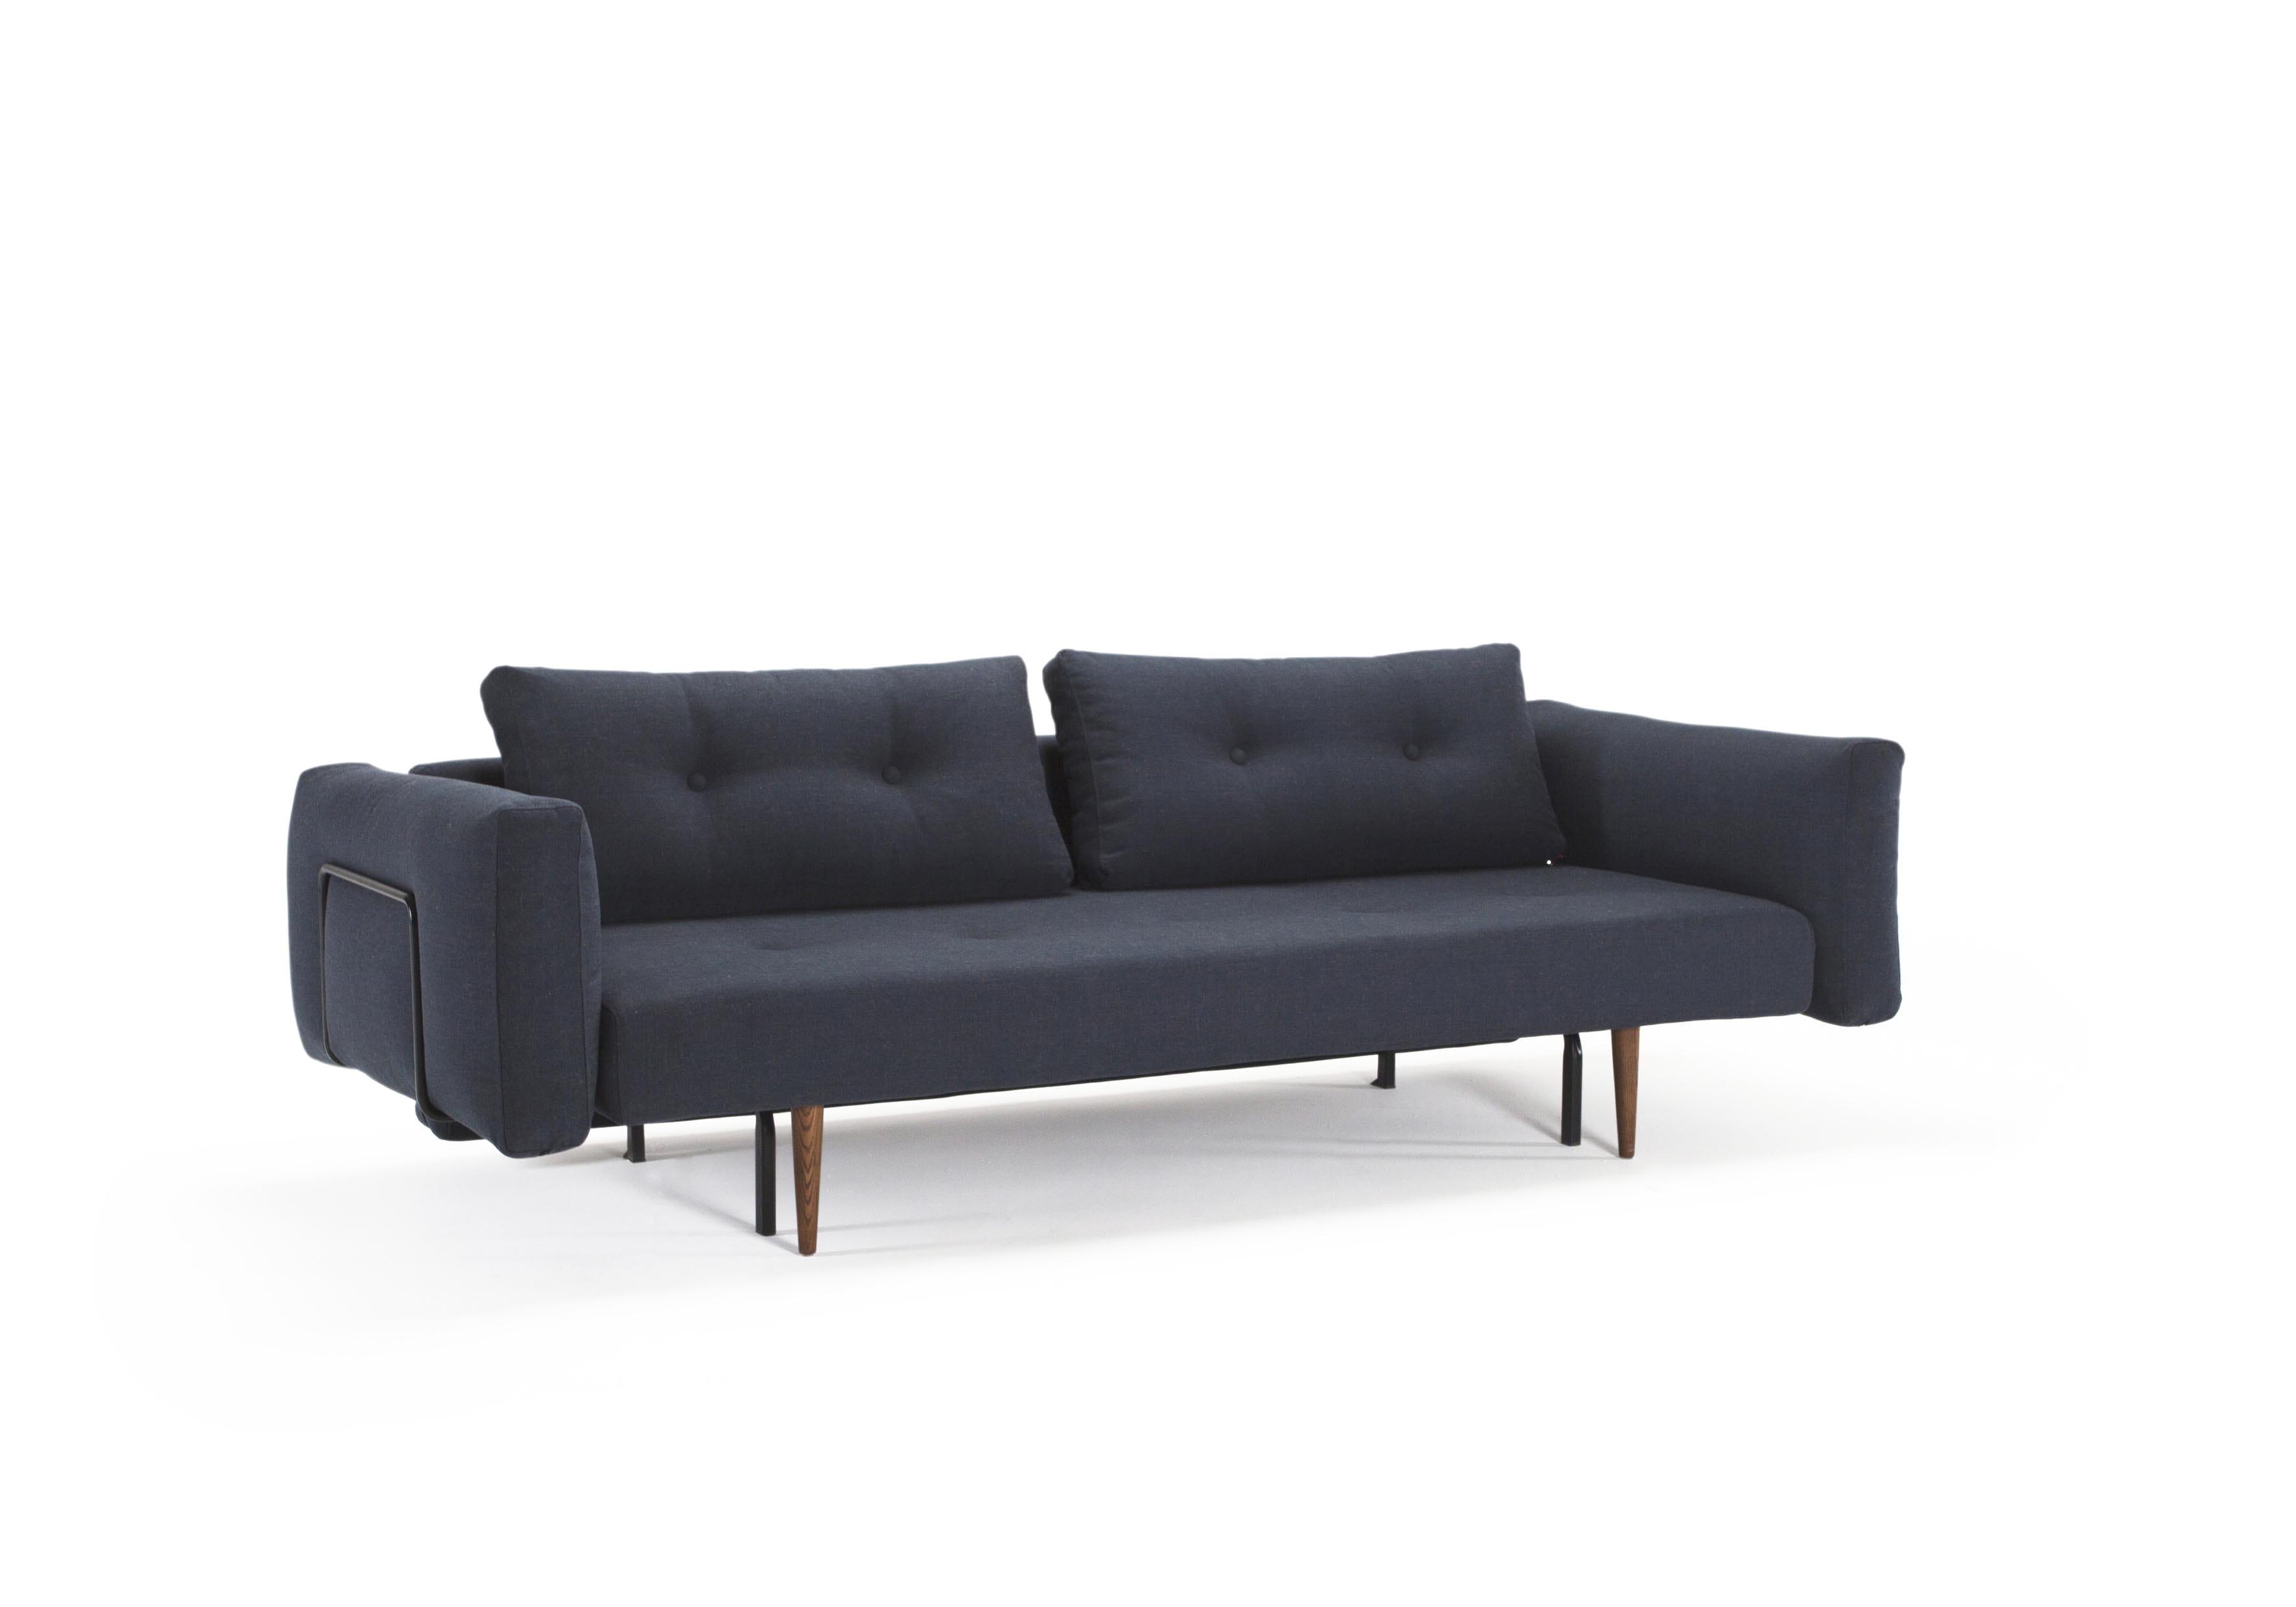 Innovation Sofa Replacement Cover Jasper Modular Sofa